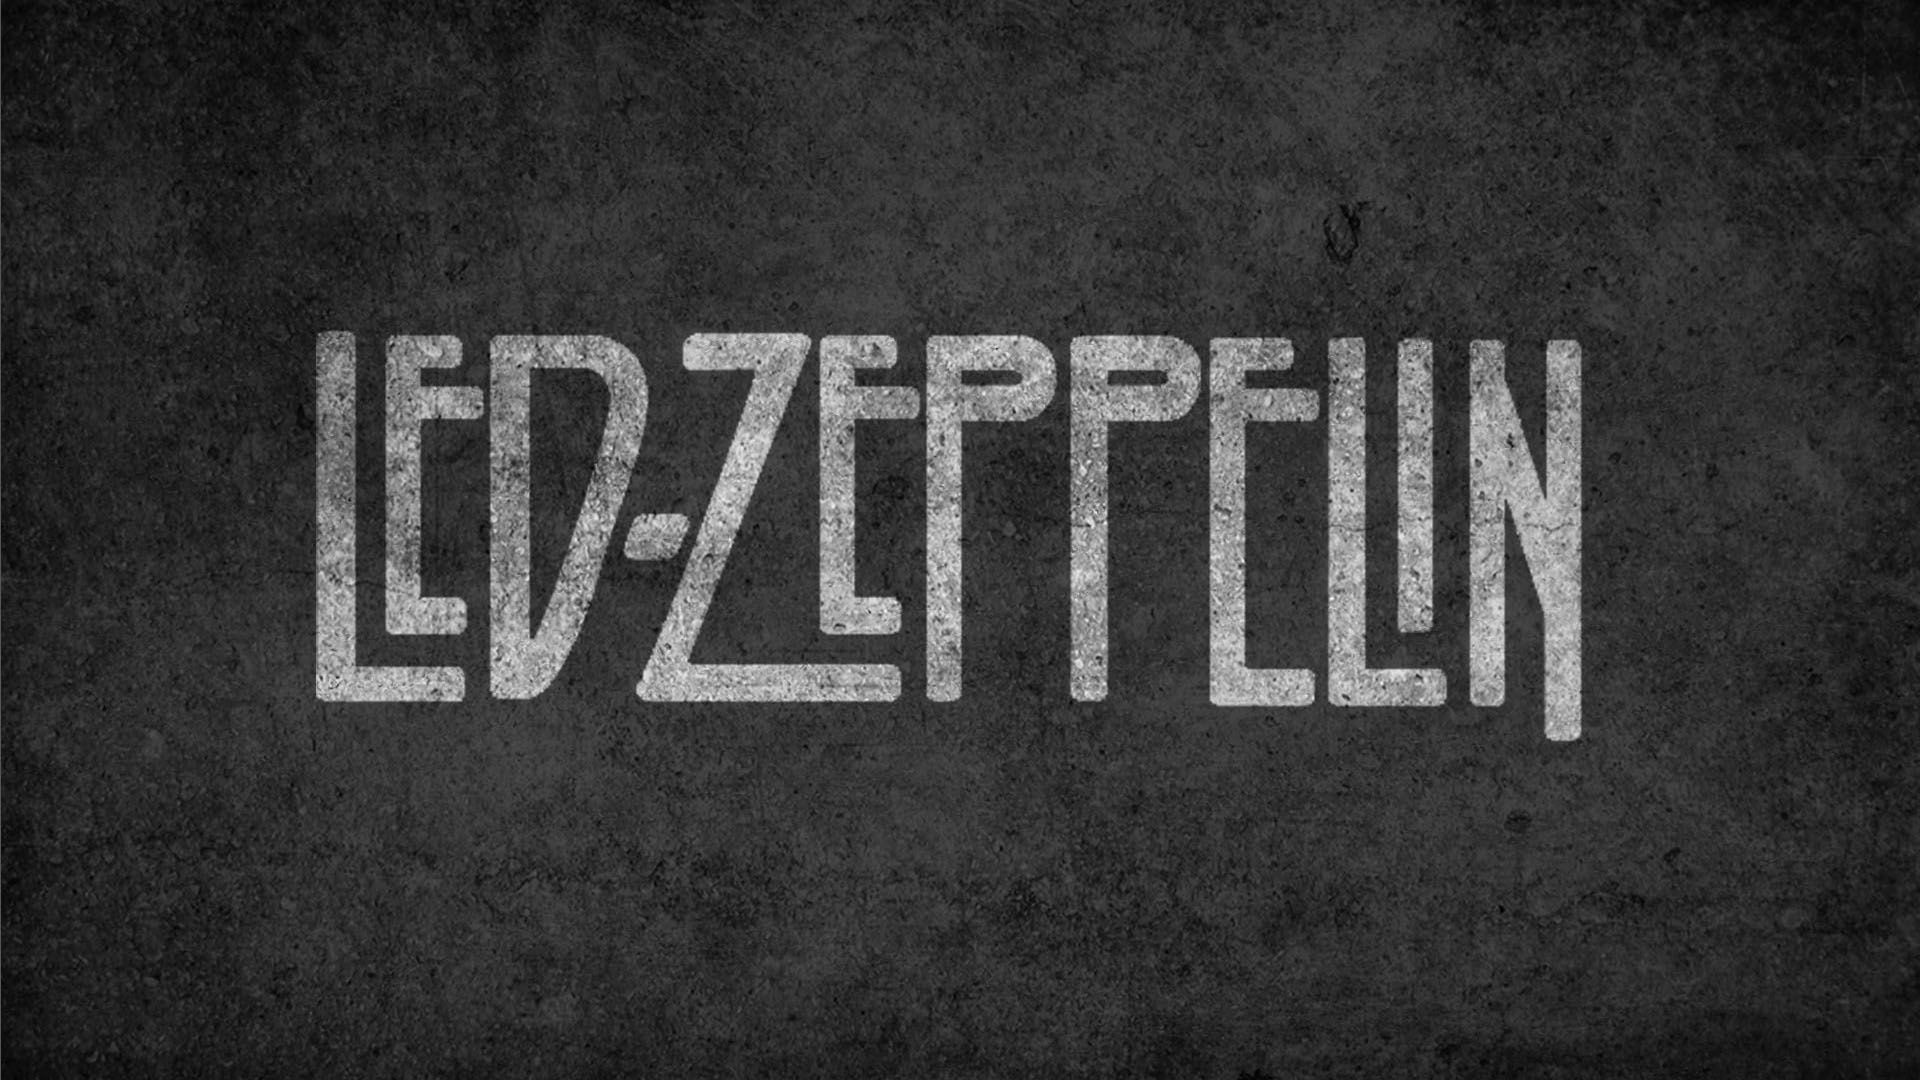 Led Zeppelin Hd Wallpapers For Desktop Download 1920 1080 Led Zepplin Wallpapers 40 Wallpapers Adorable Wallpapers